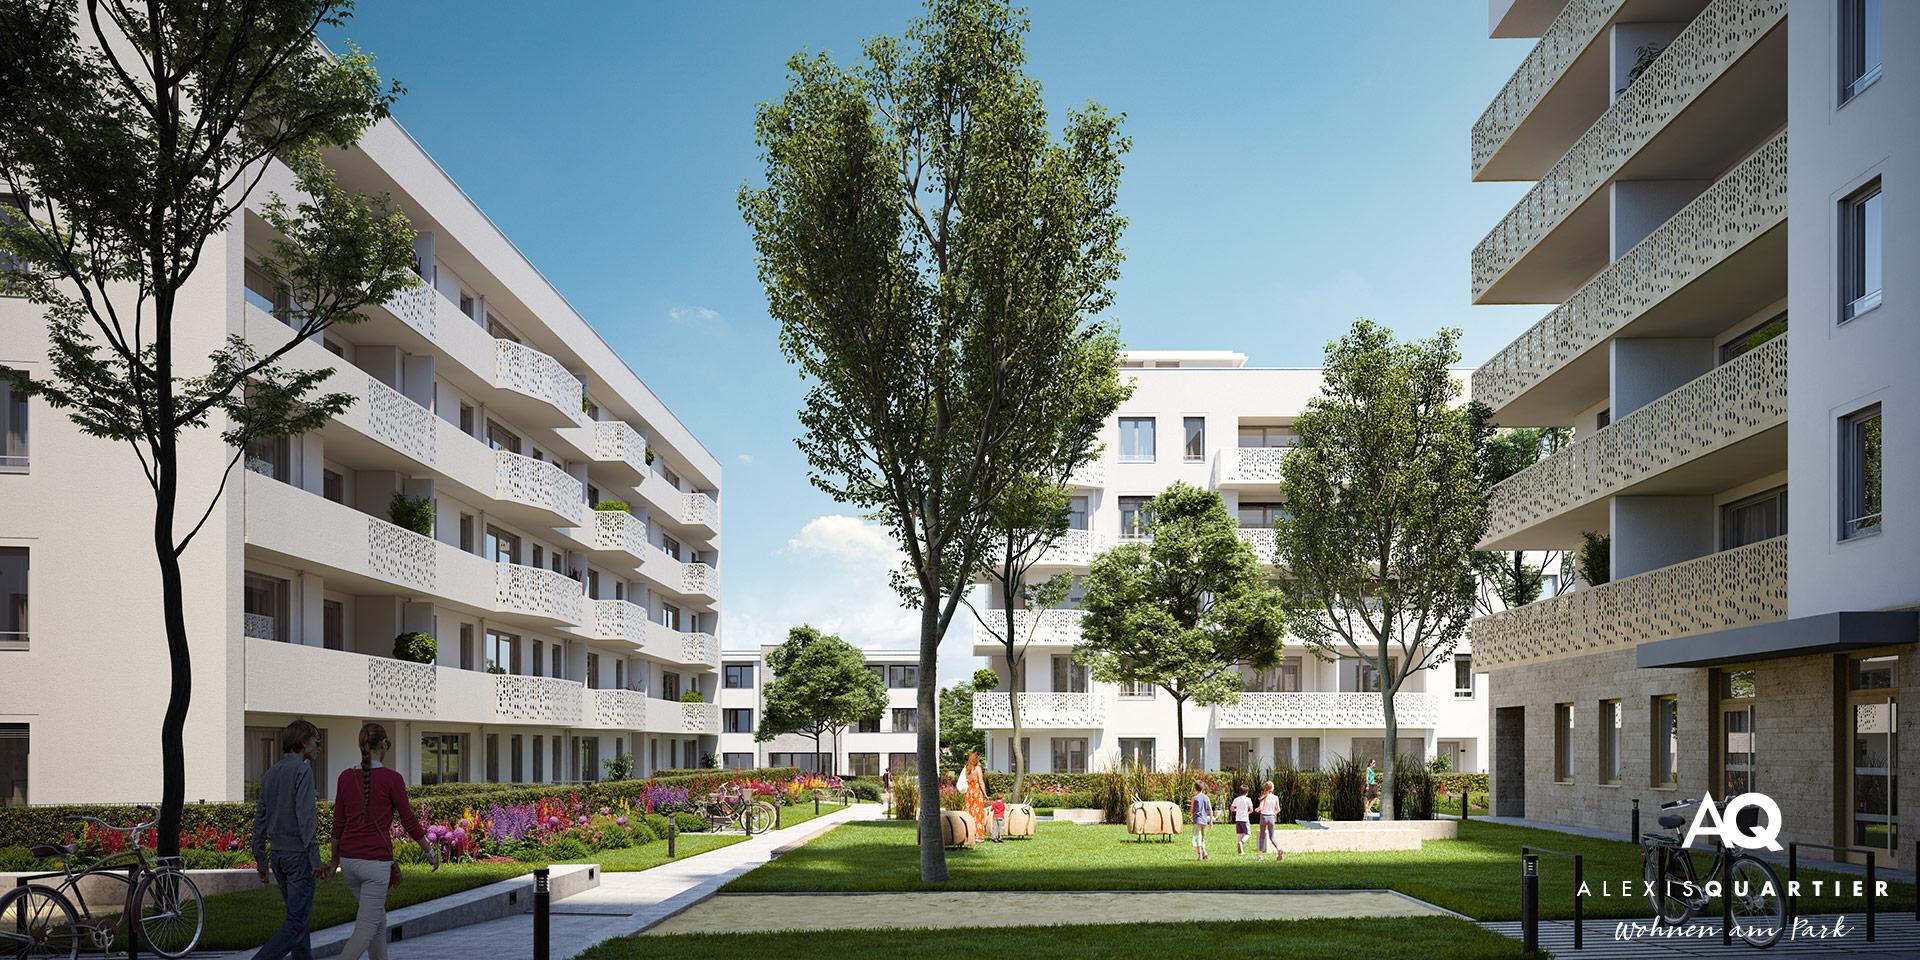 Property Munich: Alexisquartier - Wohnen am Park